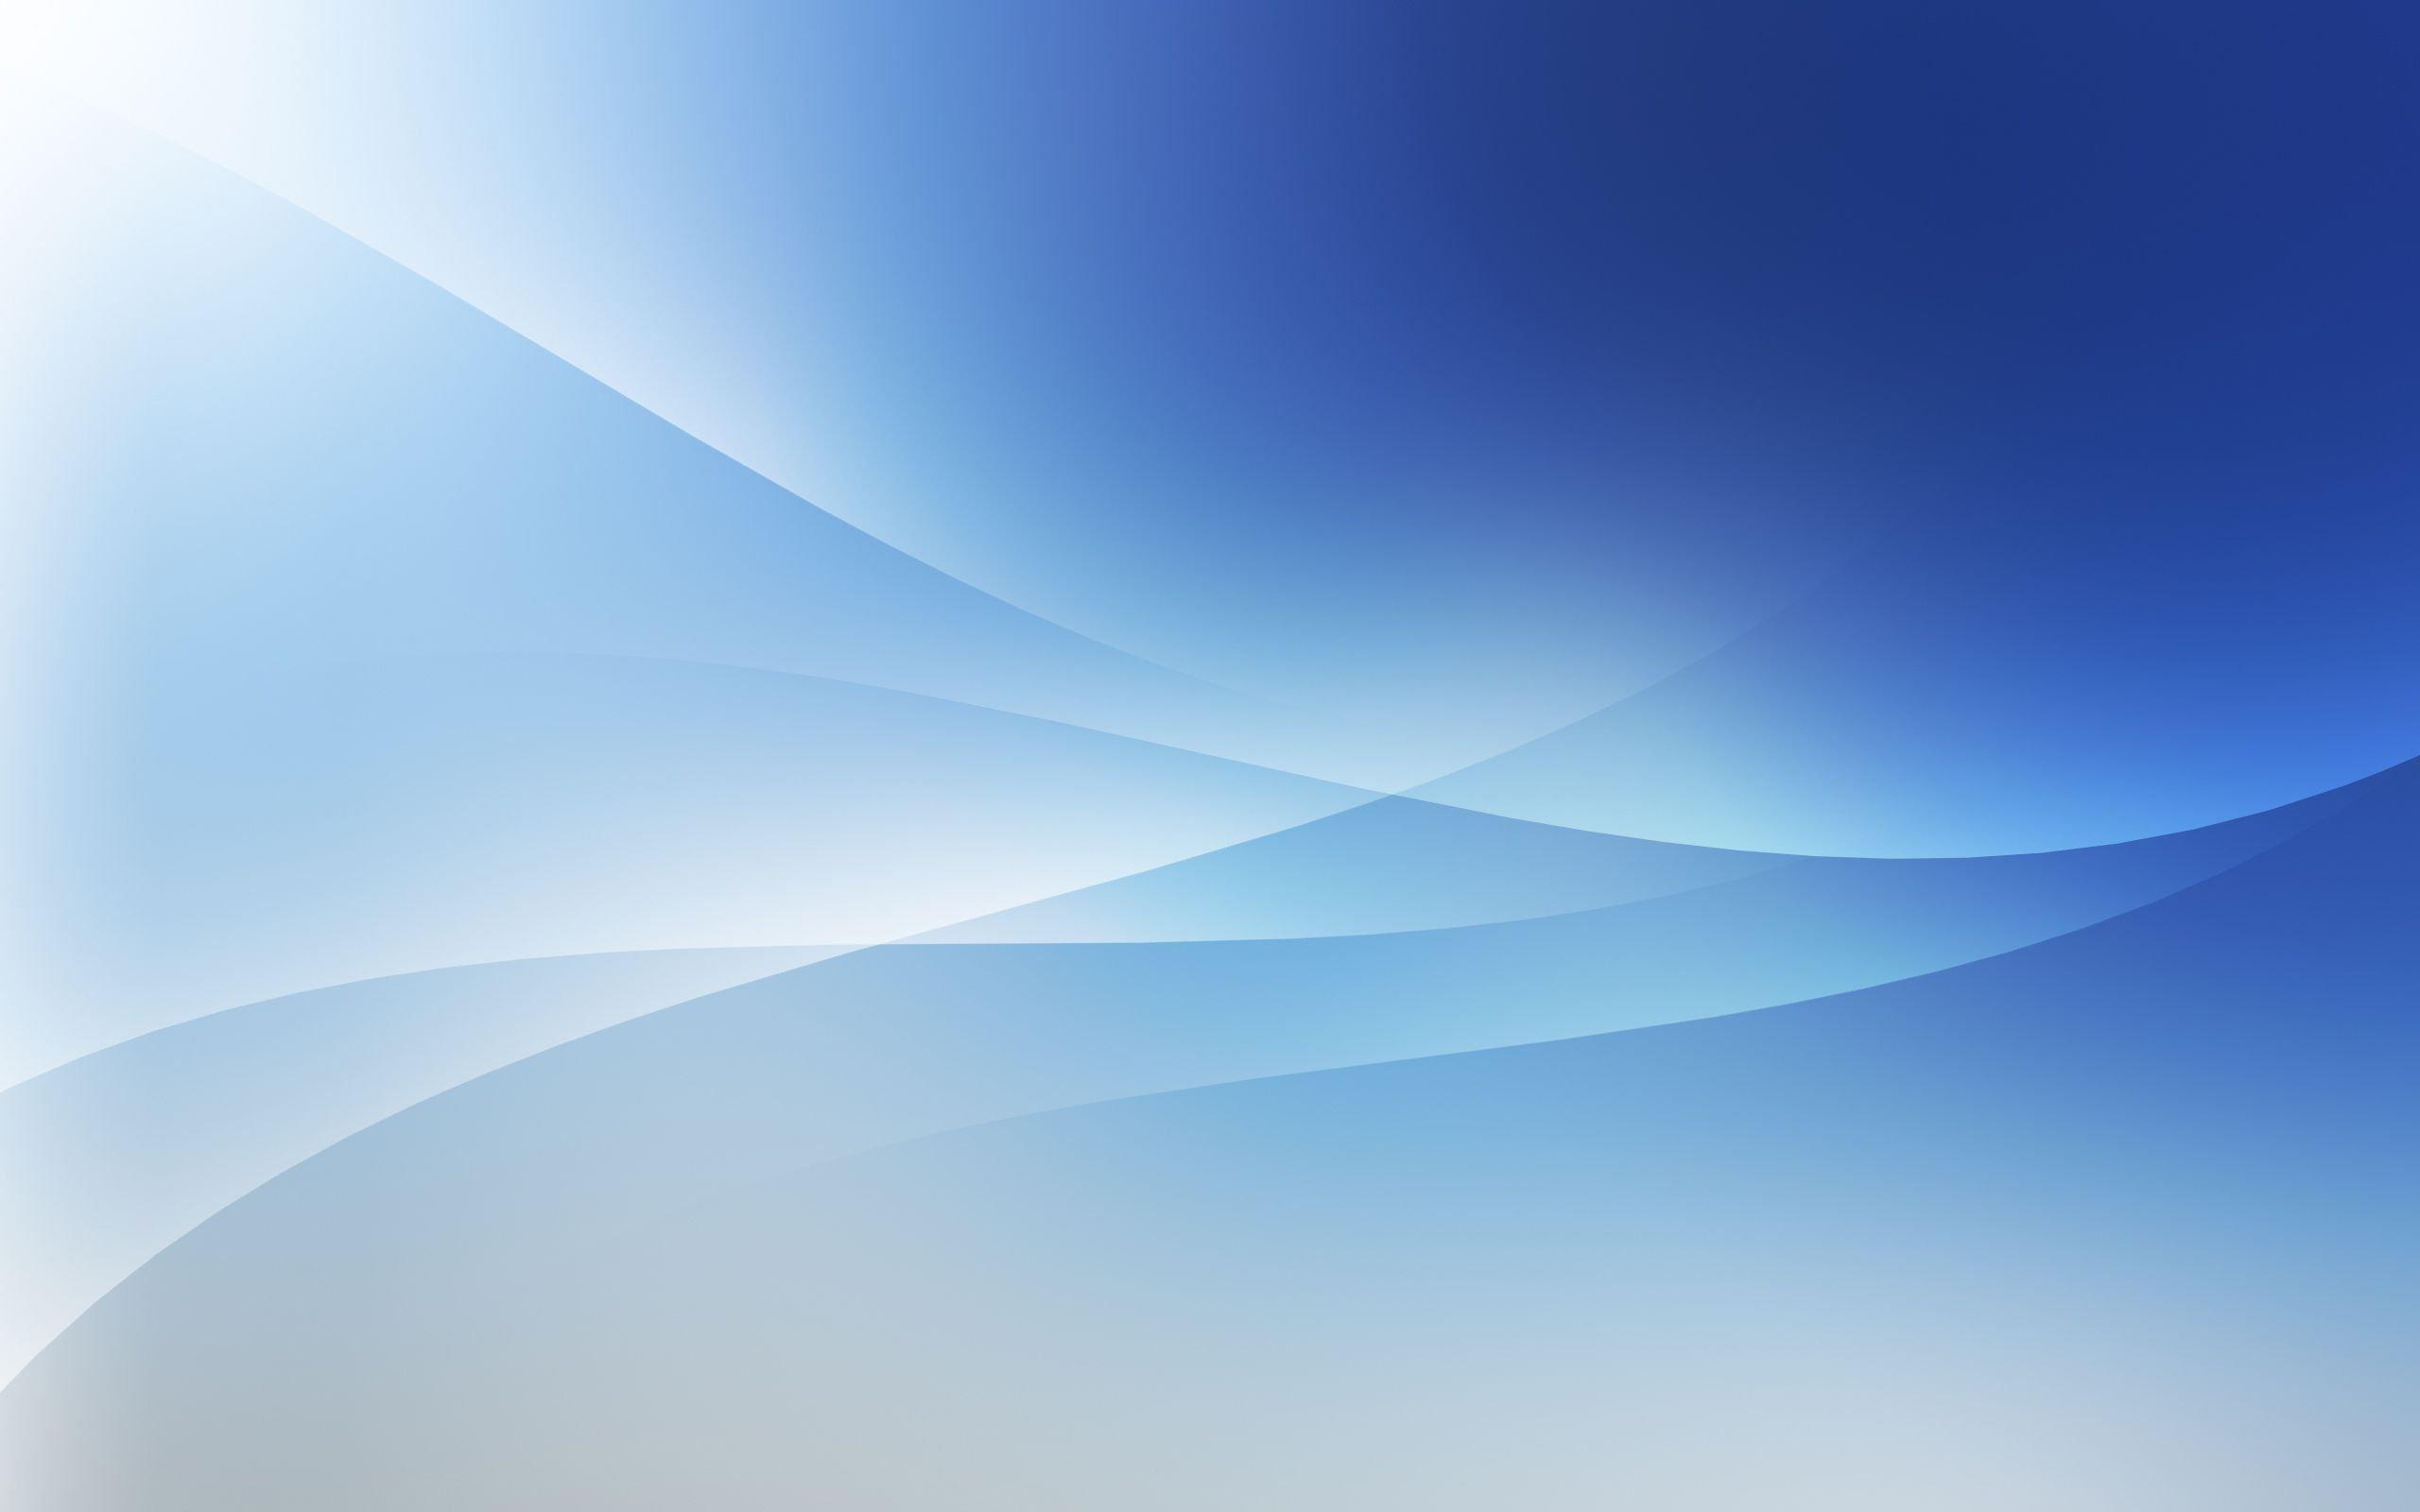 48 Blue And White Hd Wallpaper On Wallpapersafari